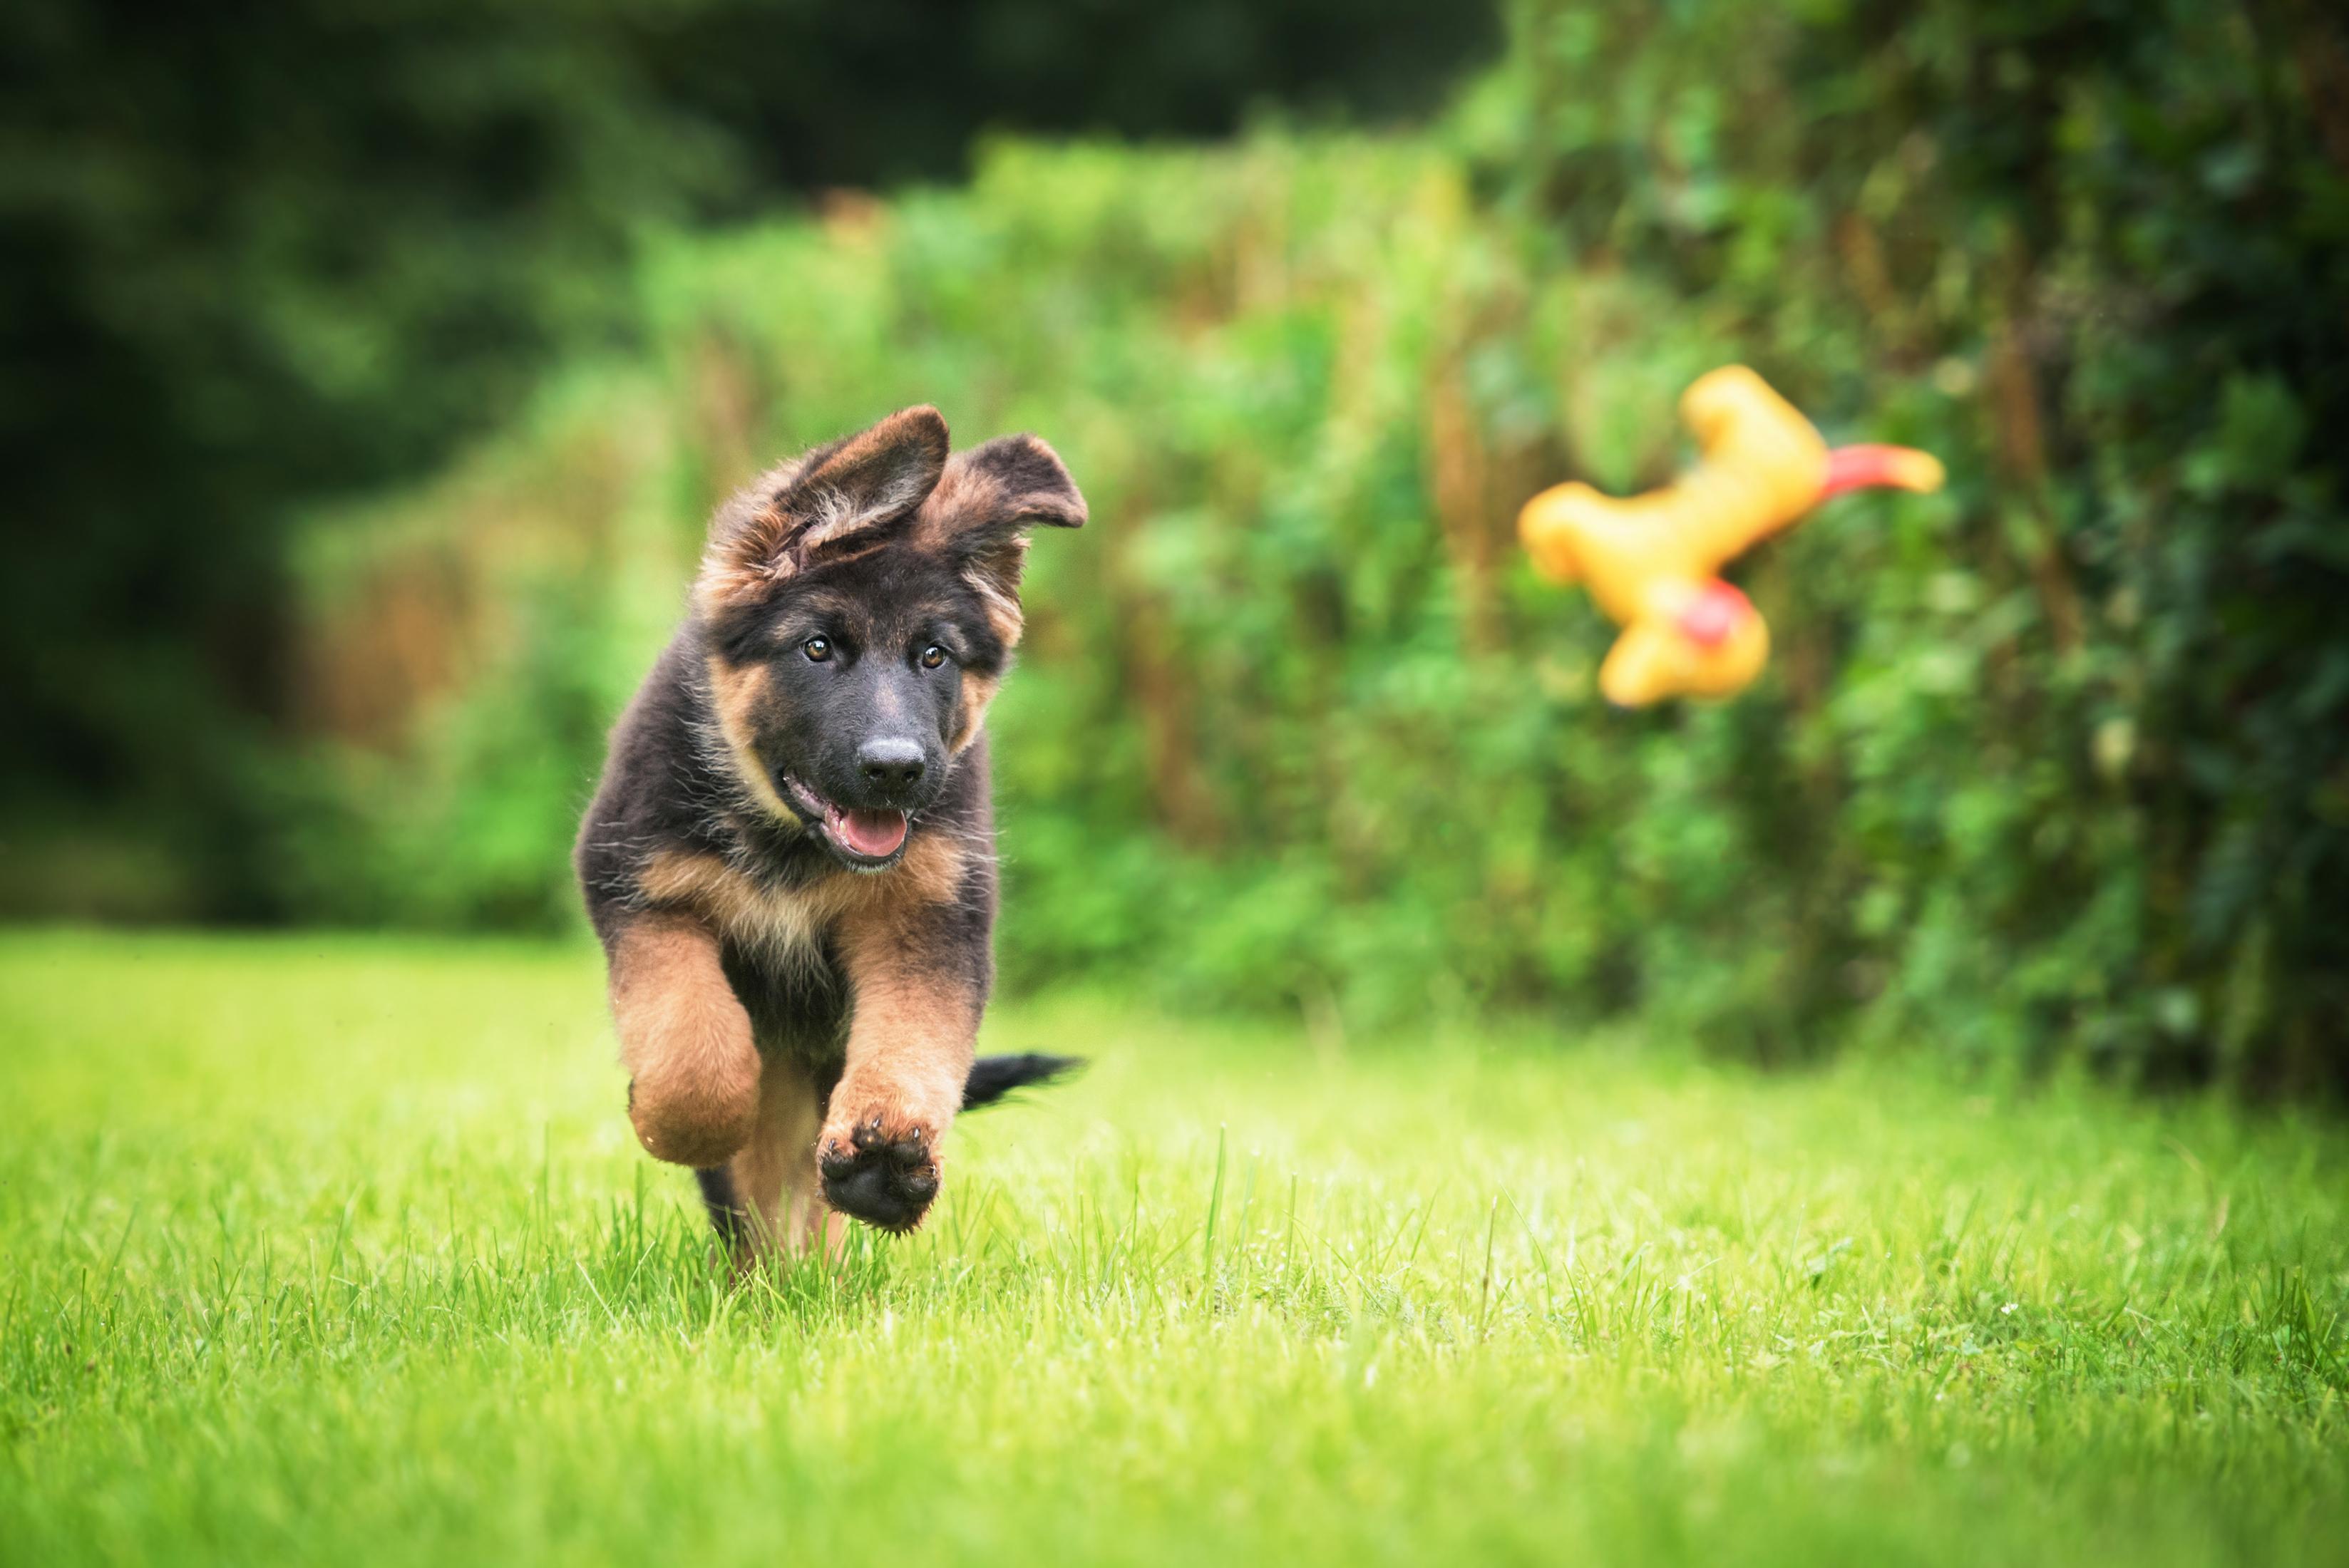 German Shepard puppy frolicking in green grass.